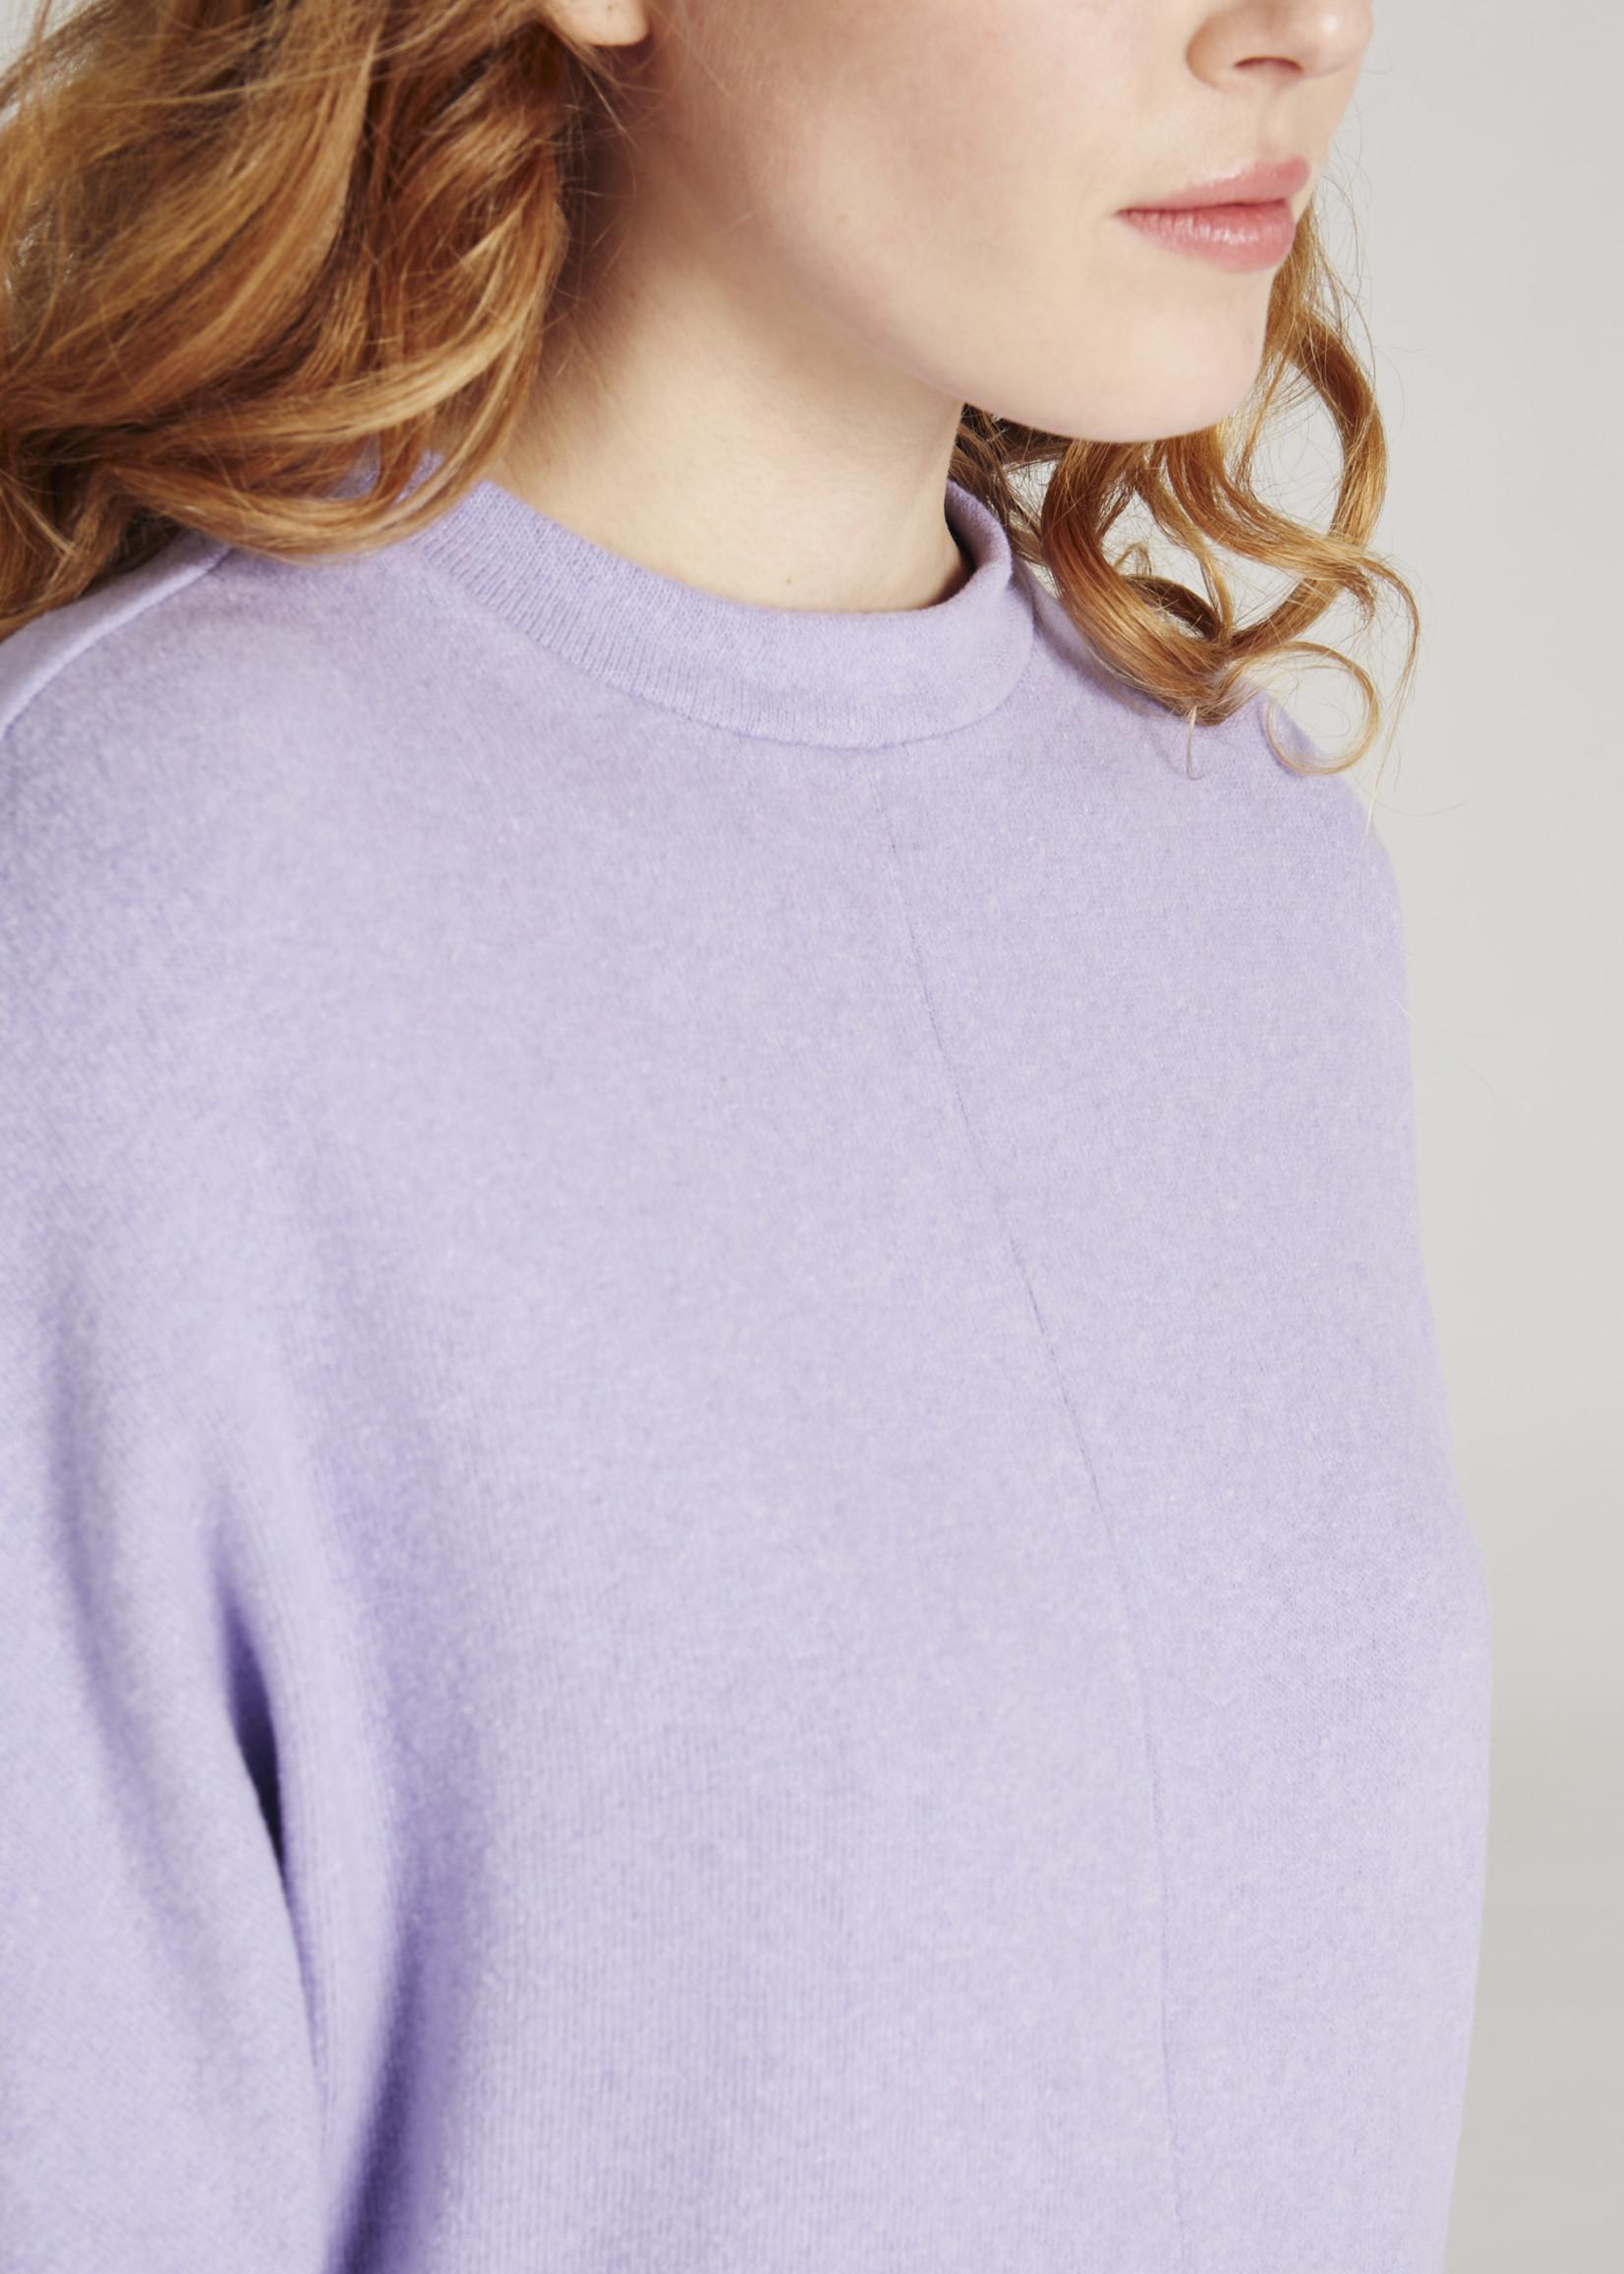 Givn Wilma Sweater